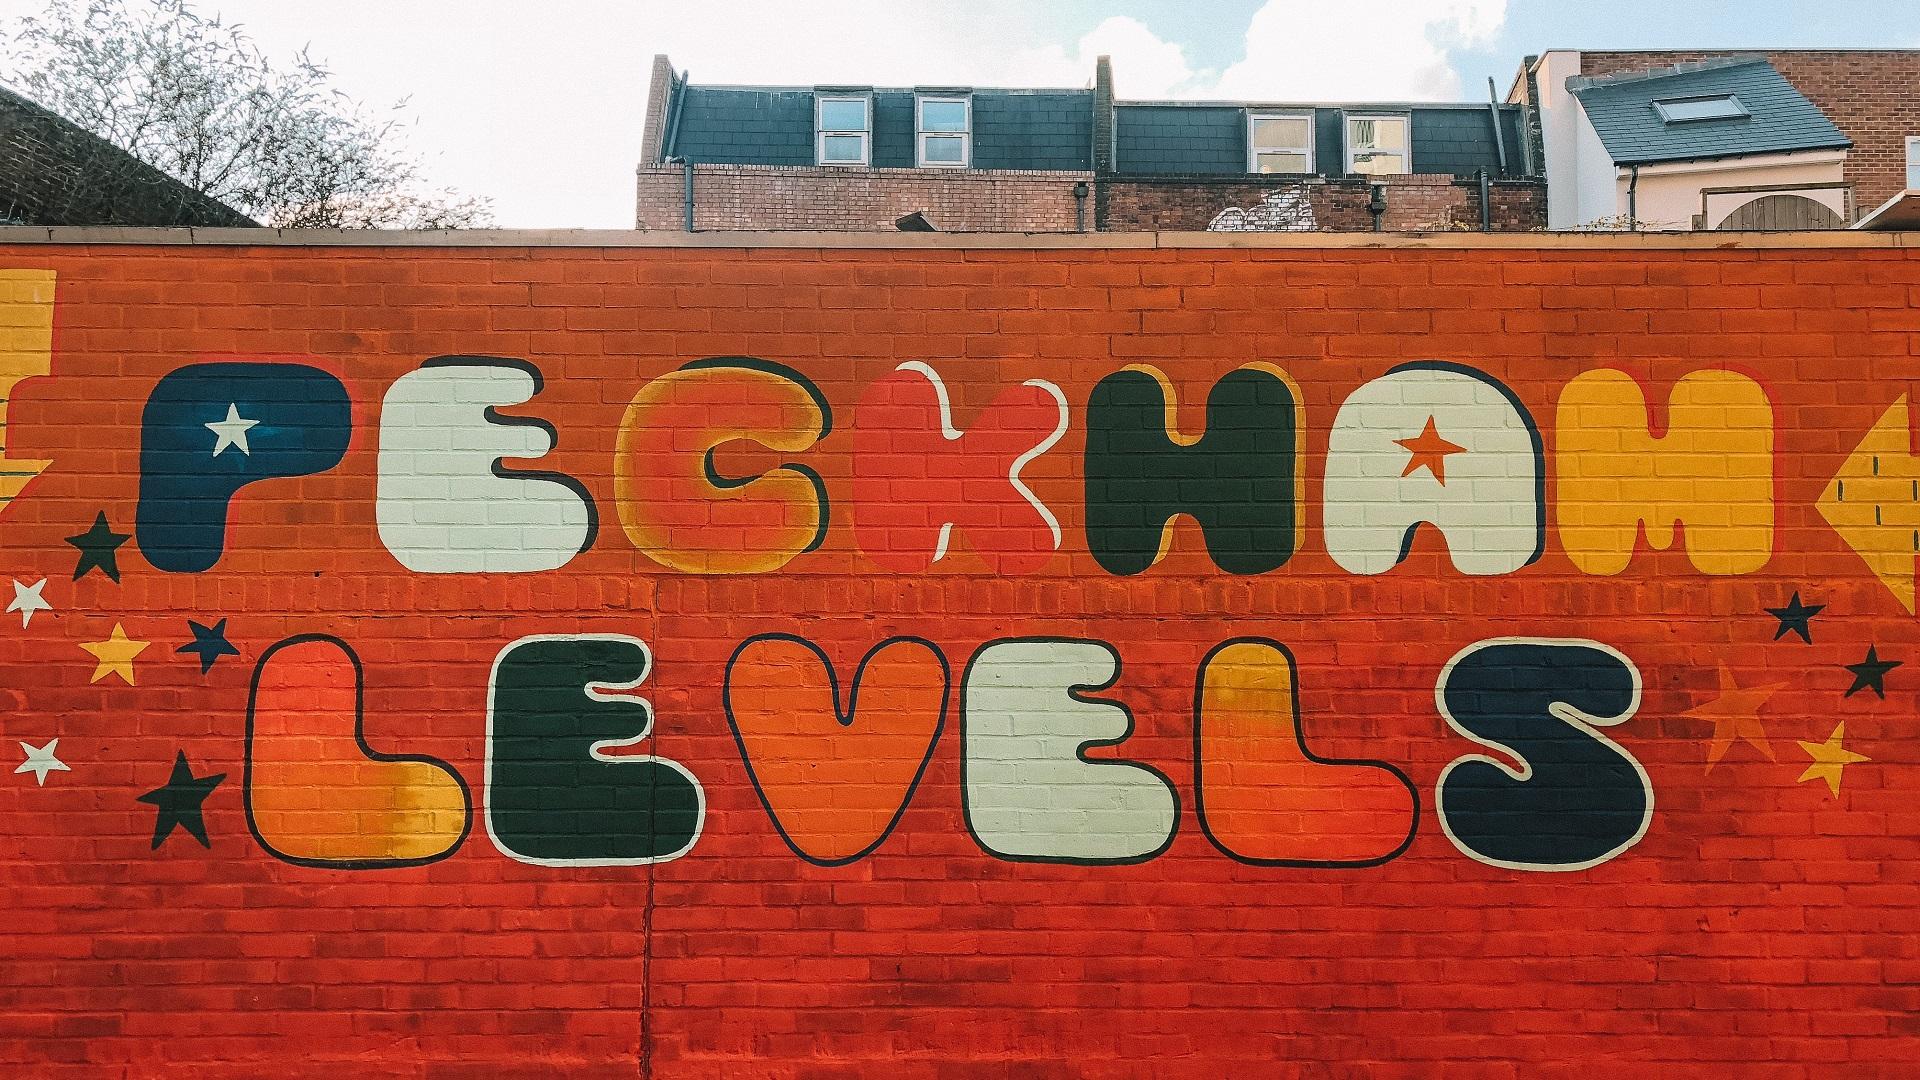 Peckham Levels written on red brick wall